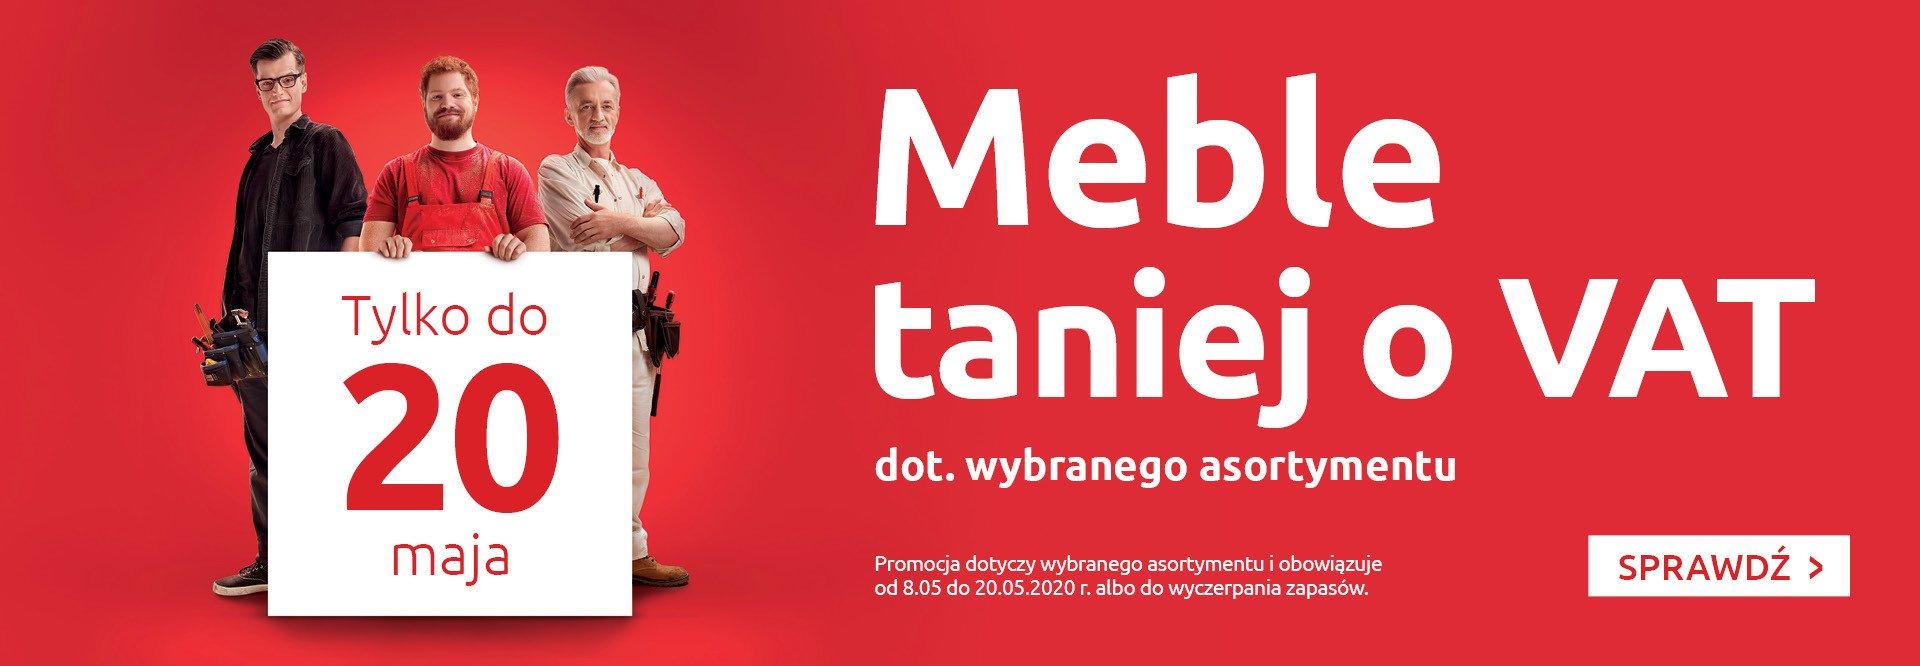 Black Red White: meble taniej o VAT